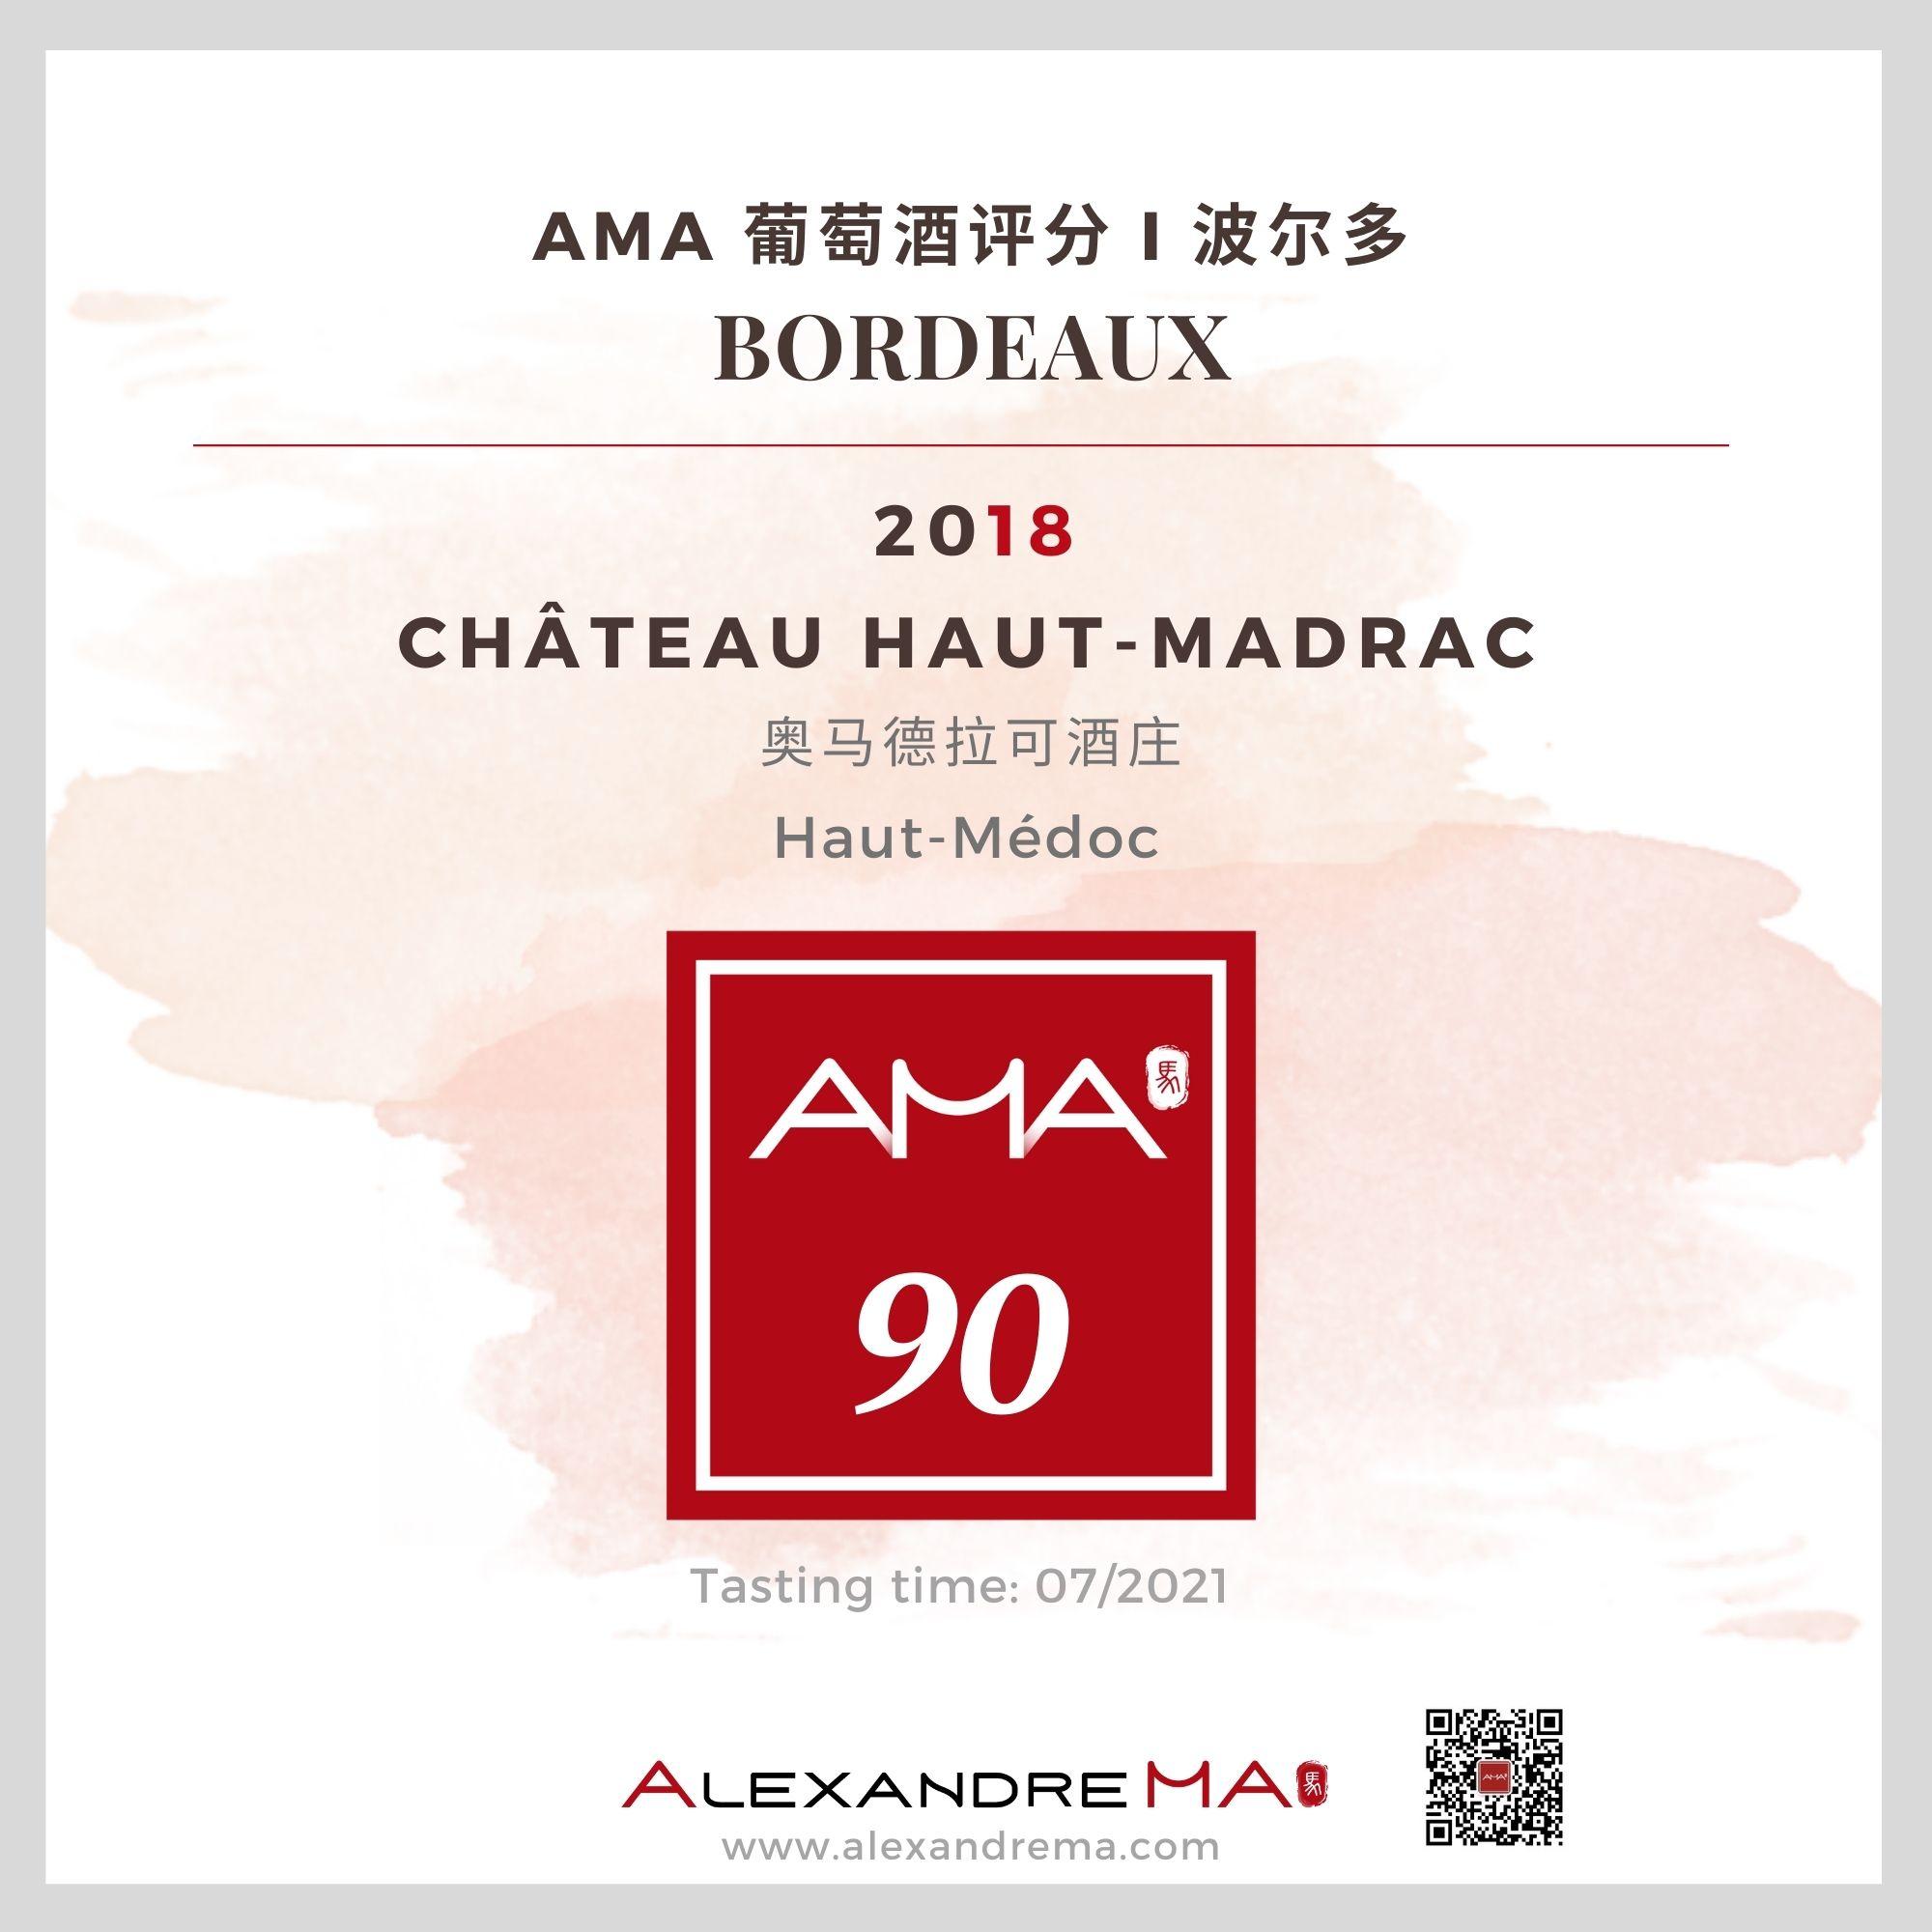 Château Haut-Madrac 2018 奥马德拉可酒庄 - Alexandre Ma